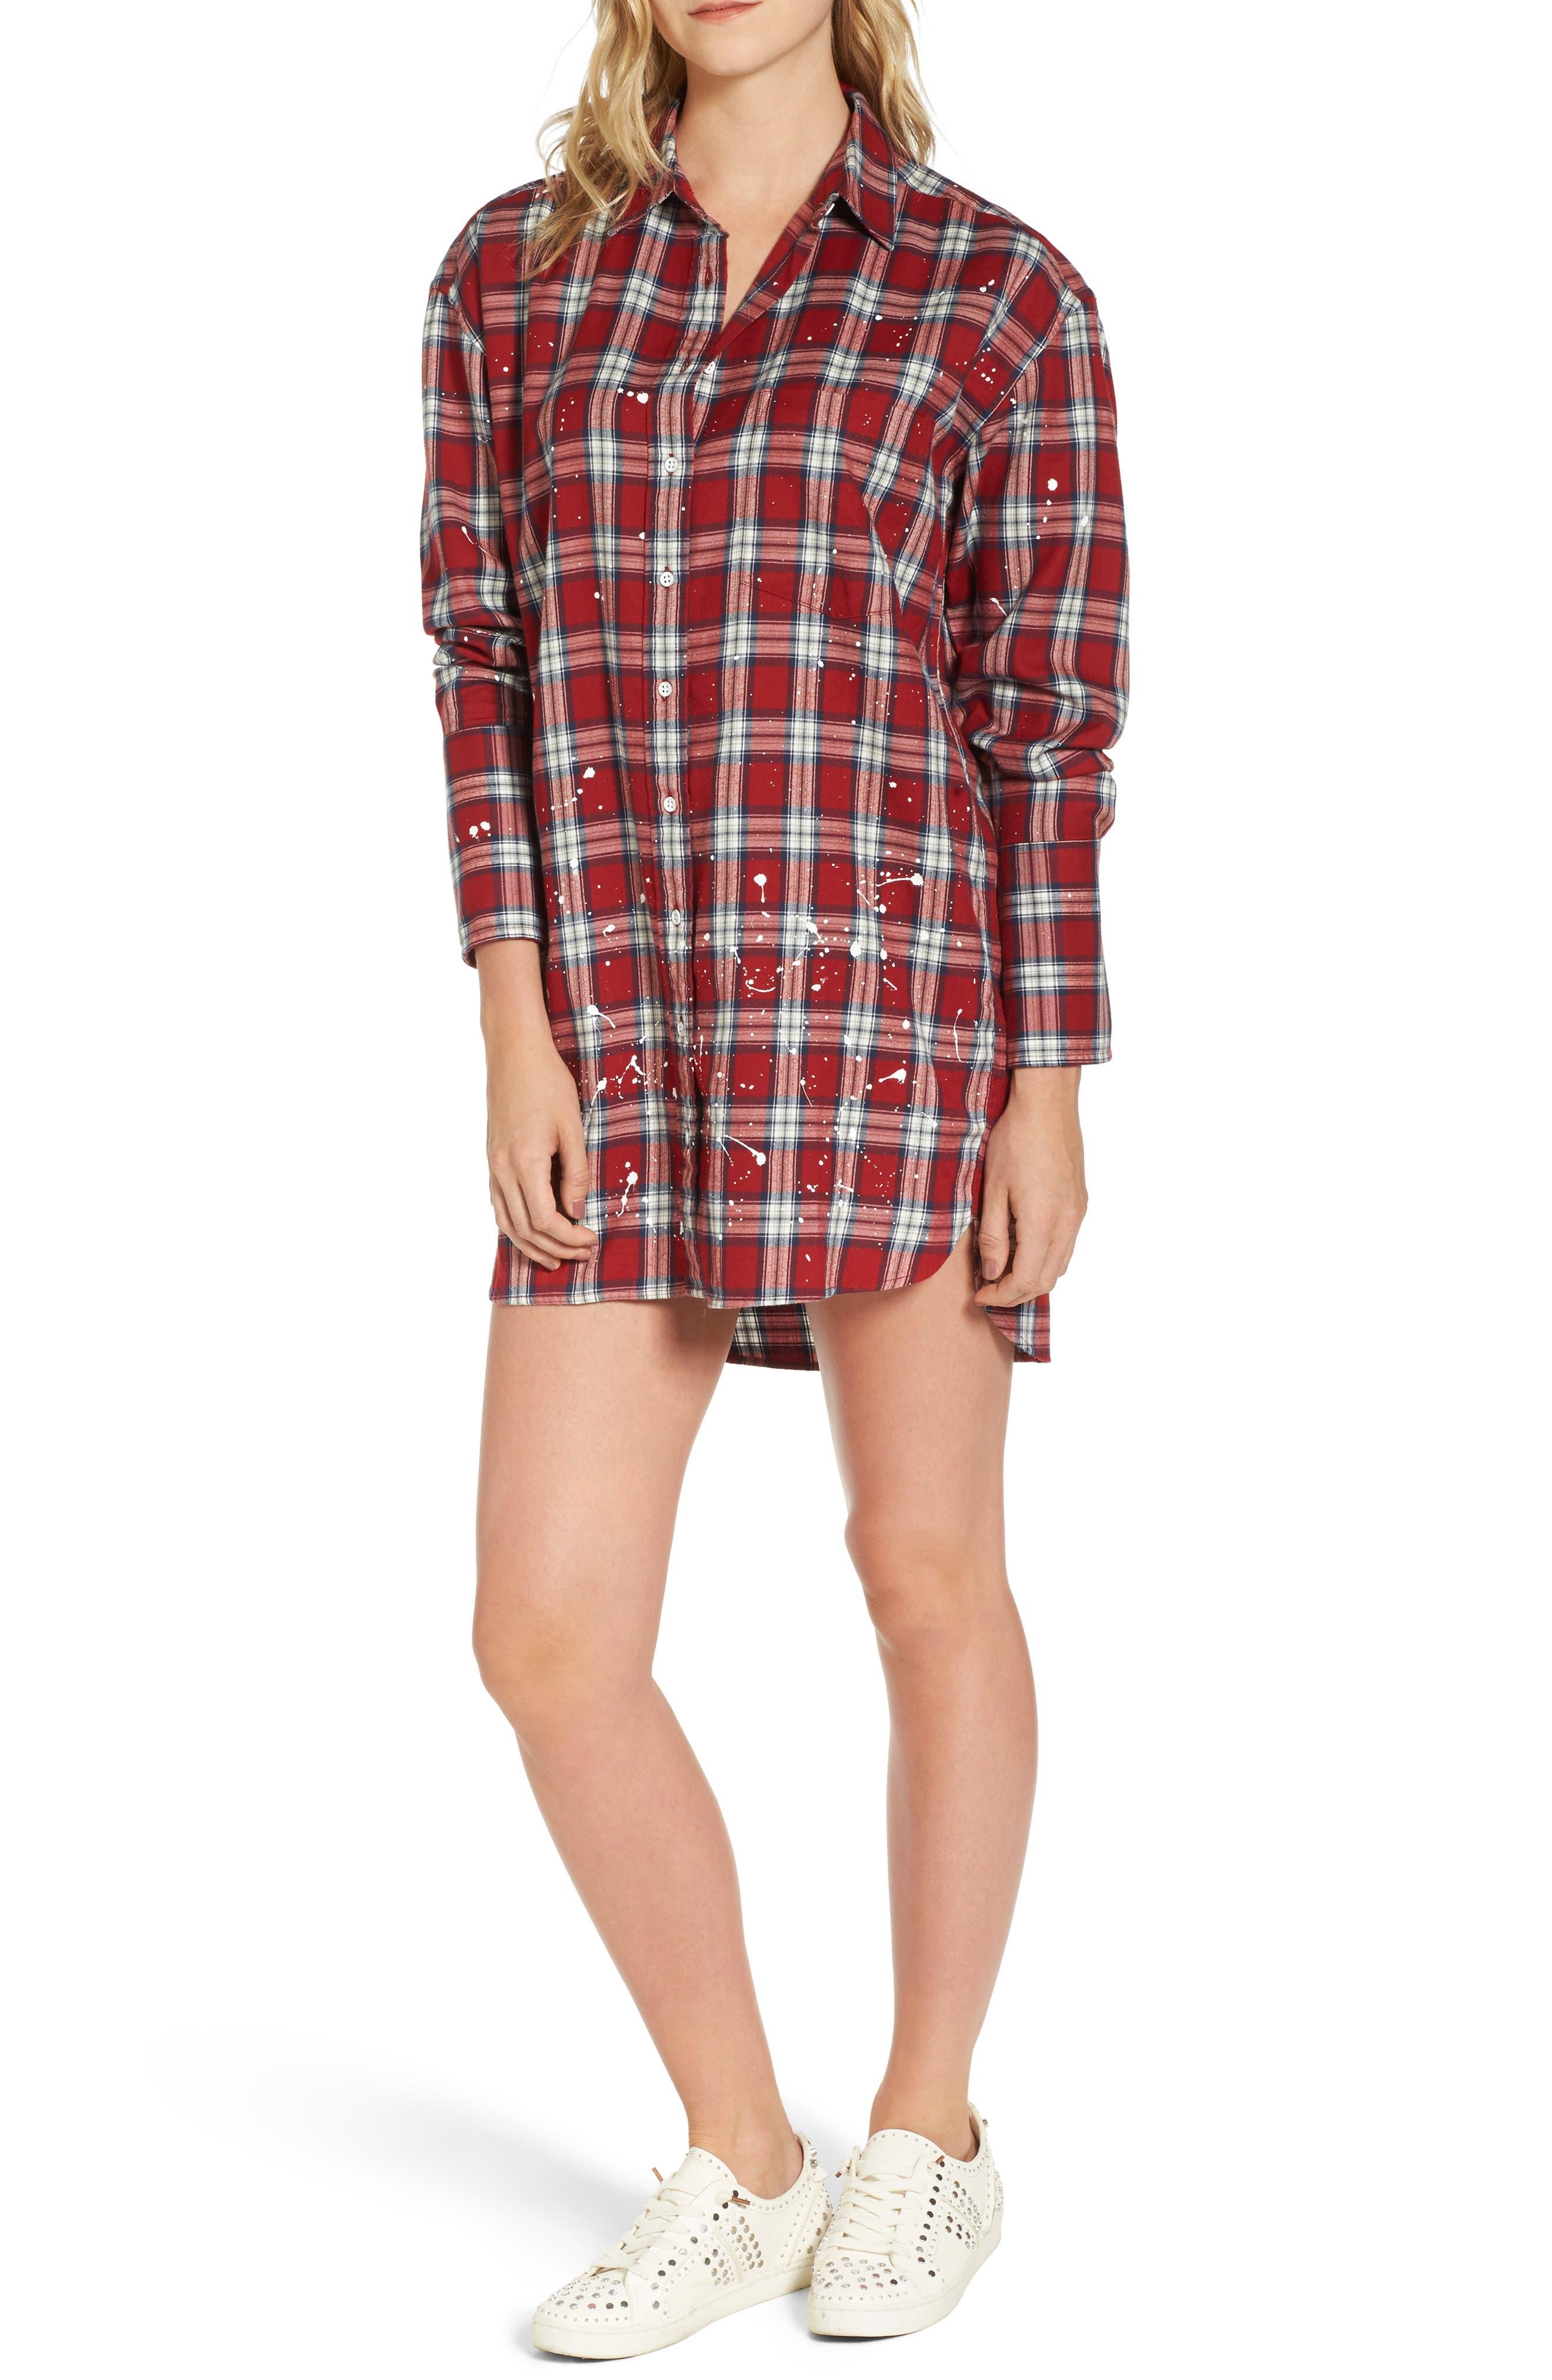 Rivington & Essex Plaid Shirtdress,                         Main,                         color, Red Plaid With Paint